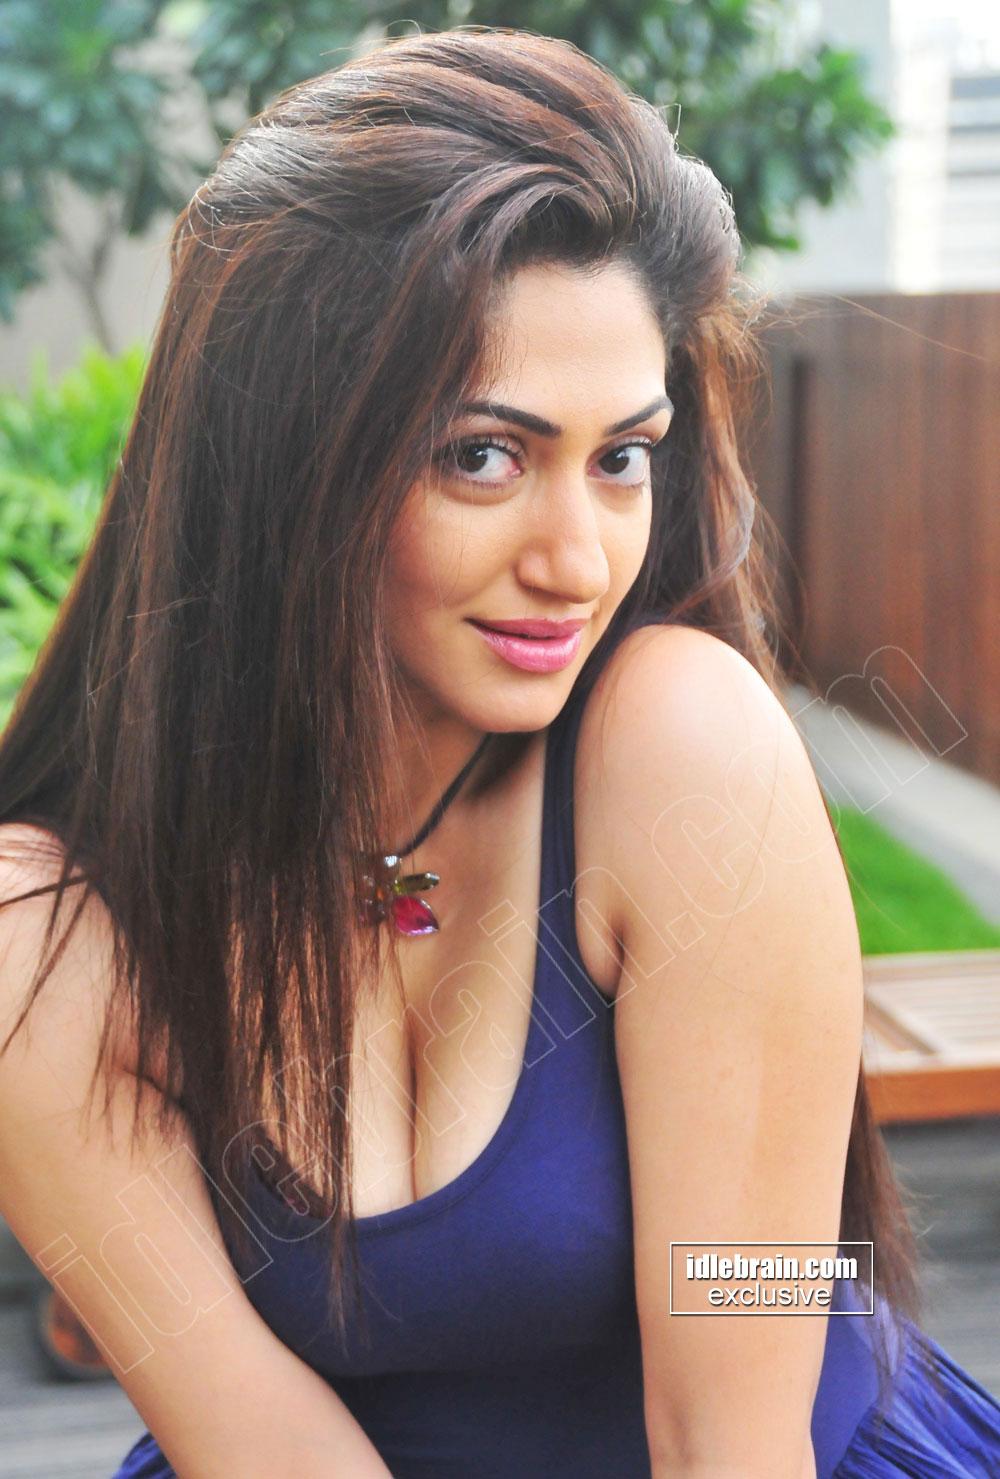 Telugu film Photo Gallery Actress Reyhna Hot Spicy